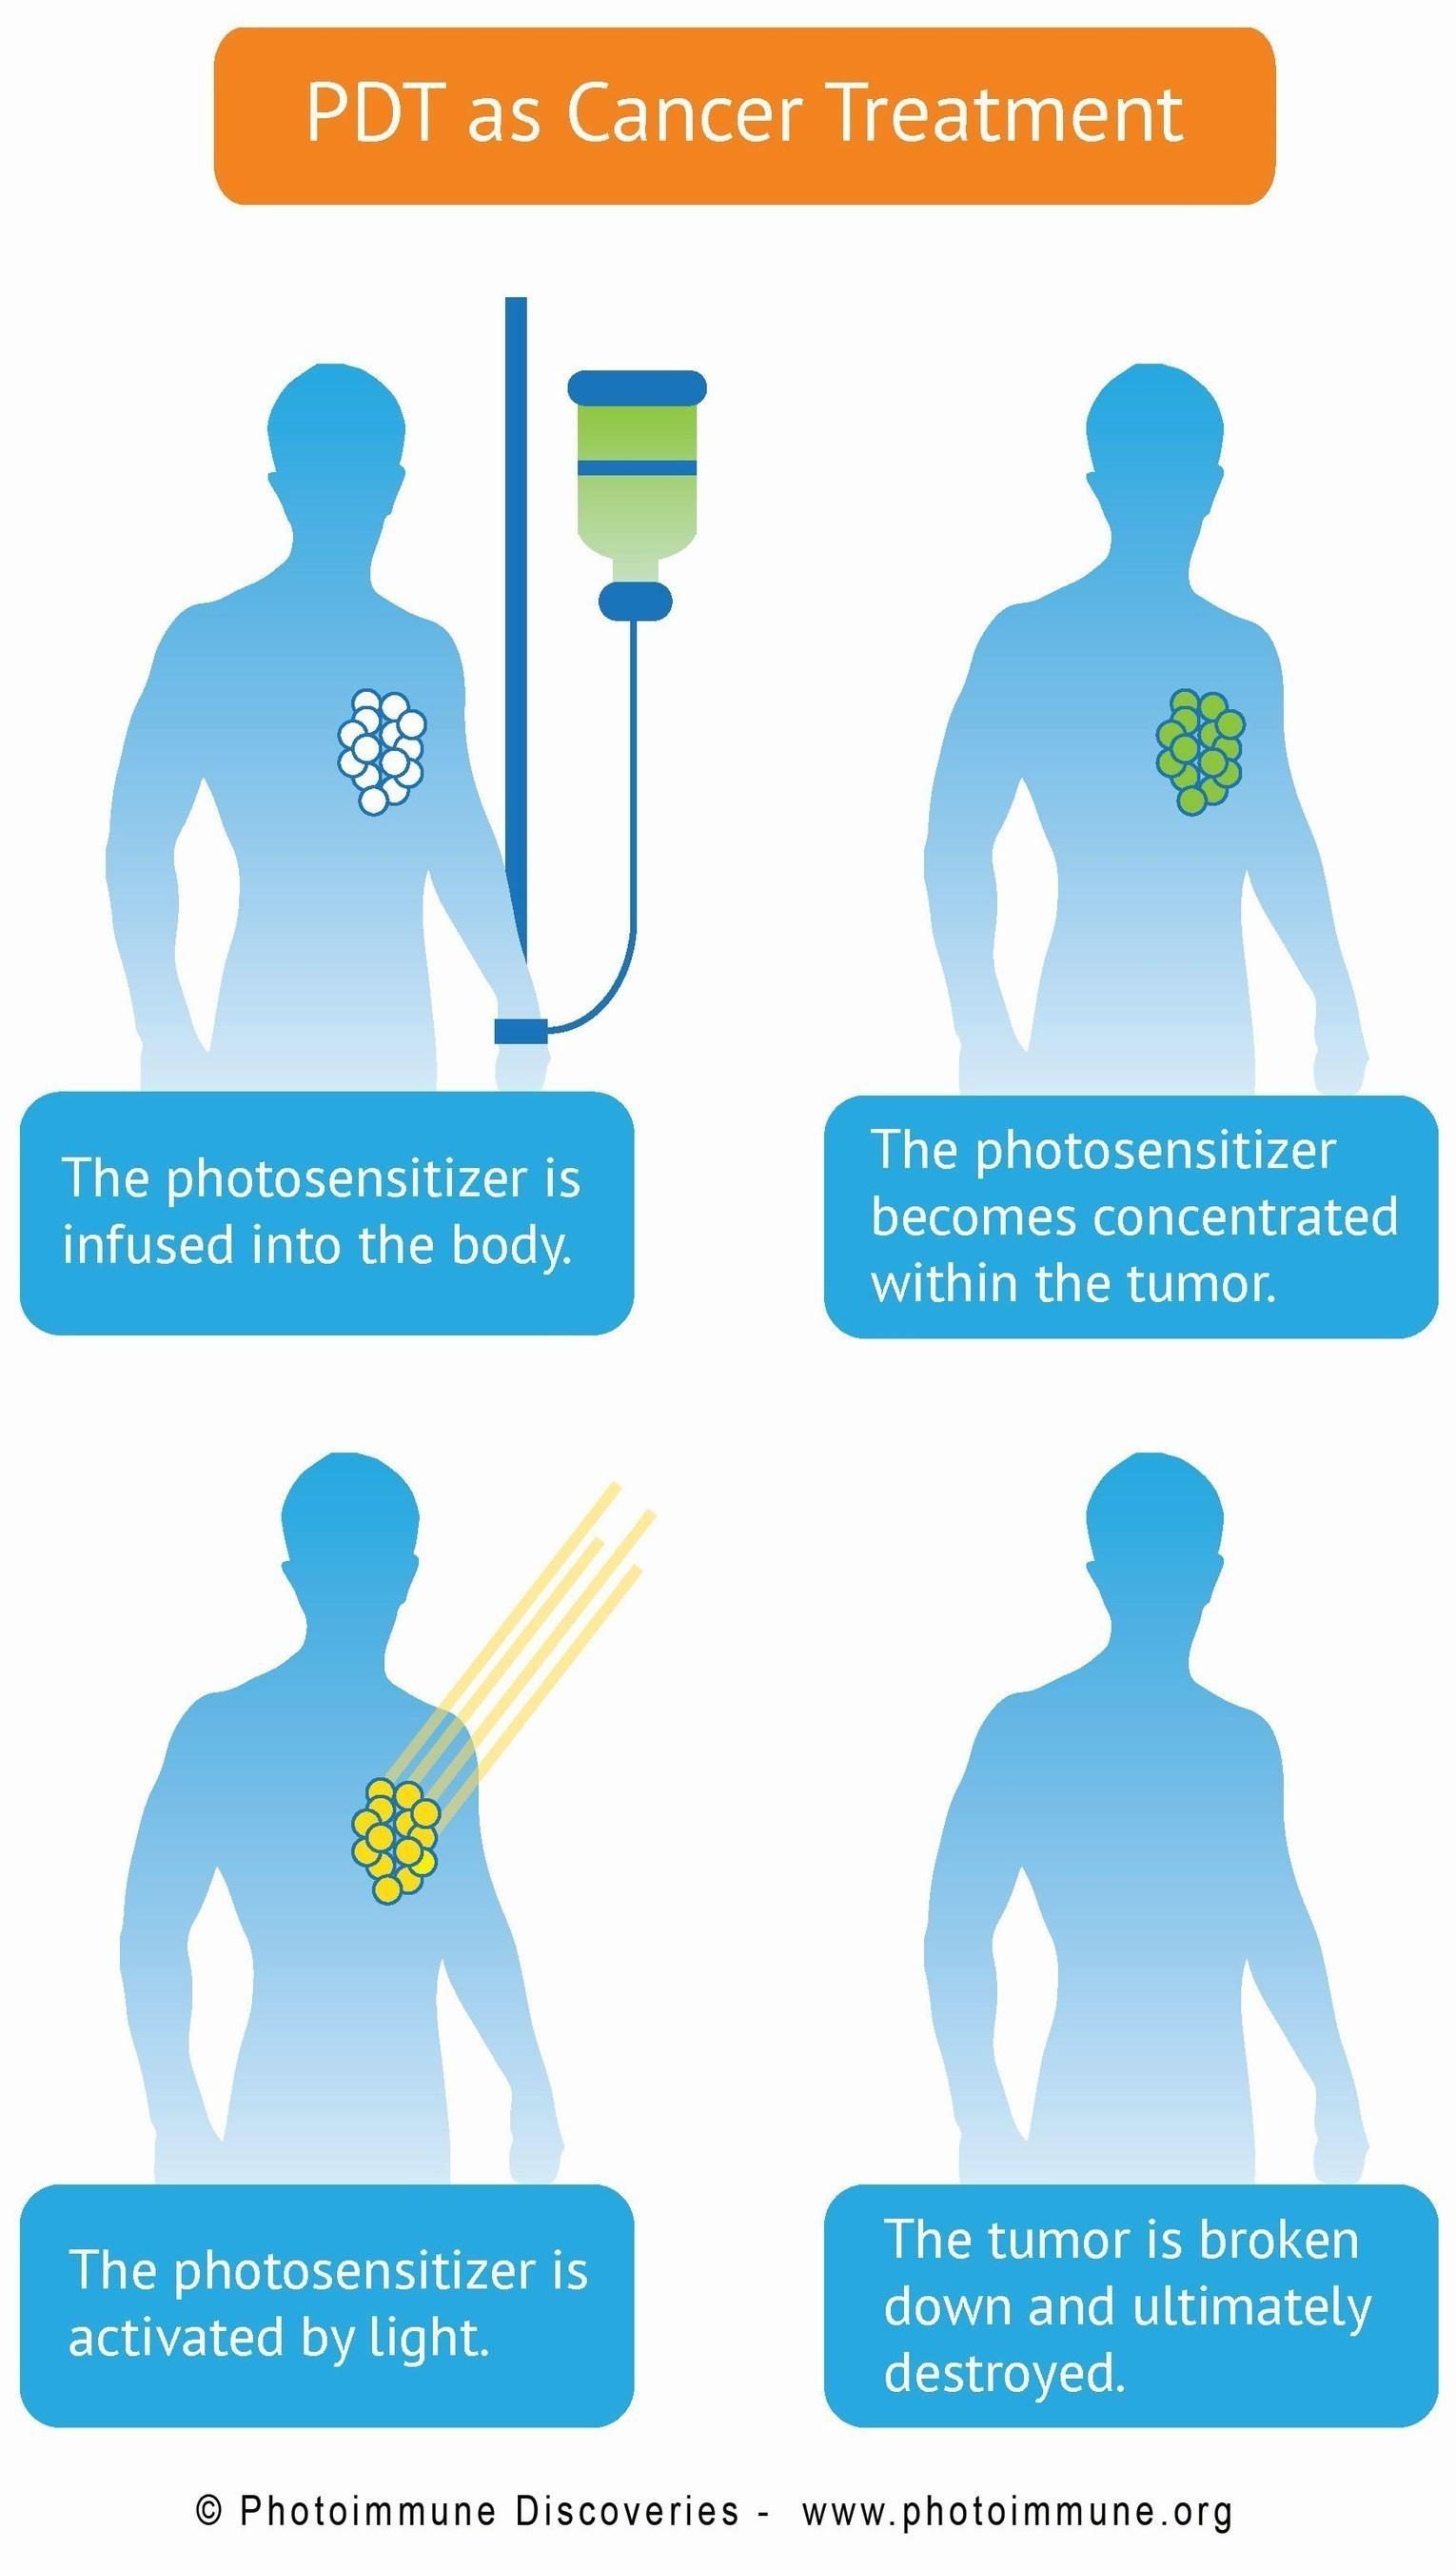 Bremachlorin - PDT as a cancer treatment (PRNewsFoto/Photoimmune Discoveries) (PRNewsFoto/Photoimmune ...